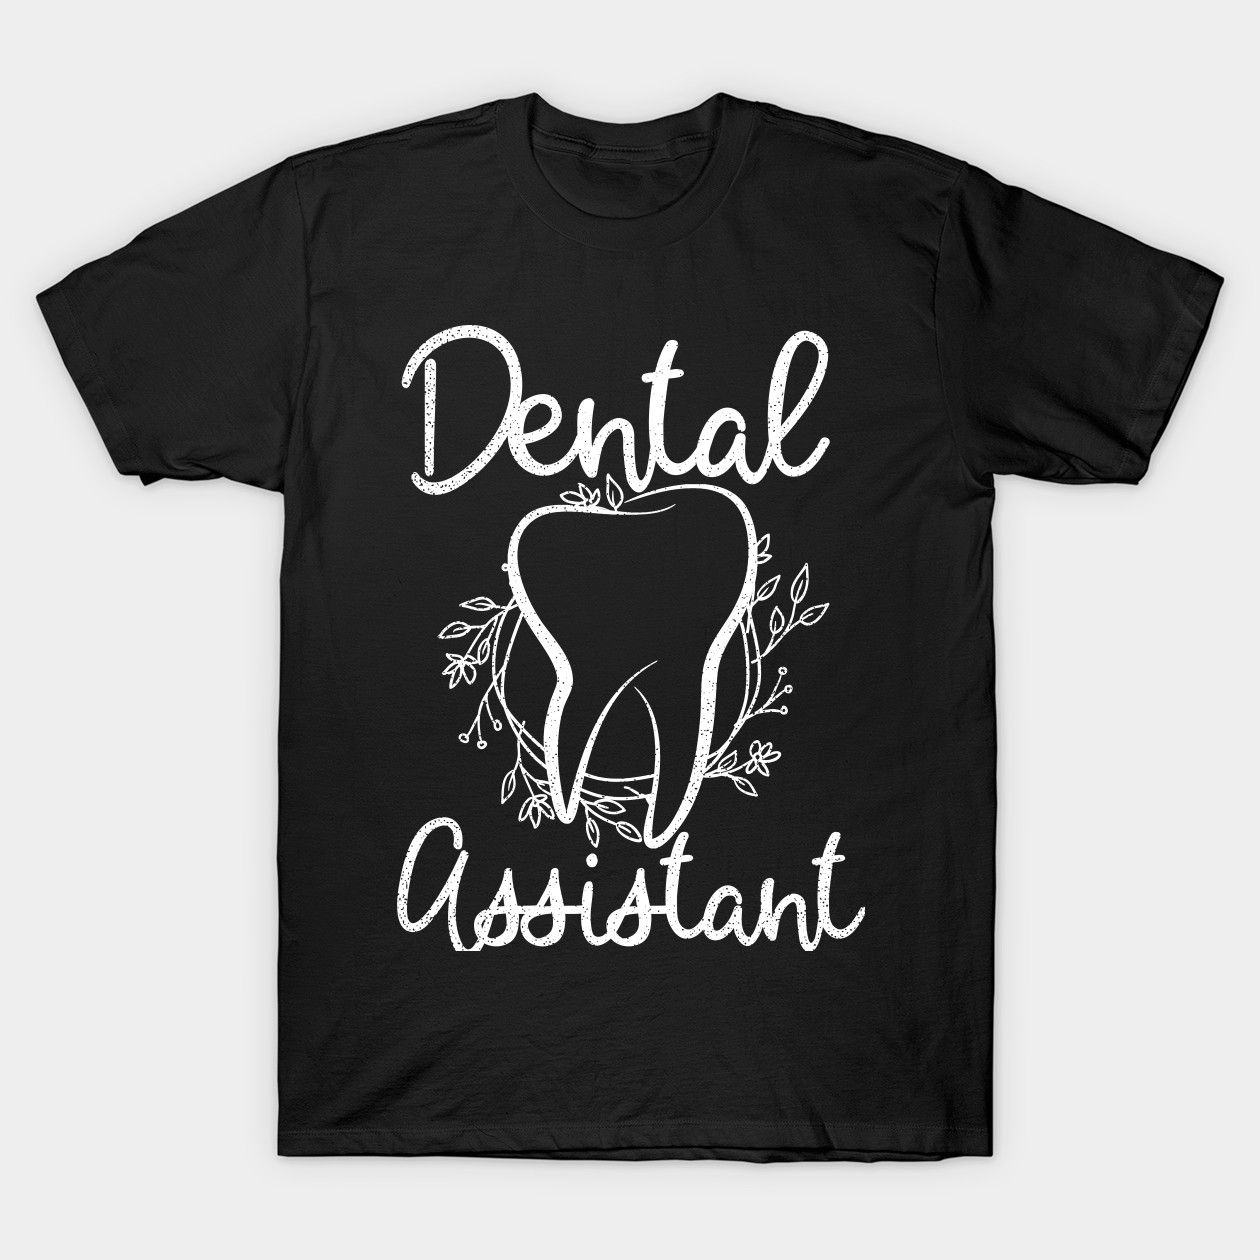 Dental Assistant Shirt   Cute Tooth Gift cute-tooth-gift Classic T-Shirt #dentalassistant